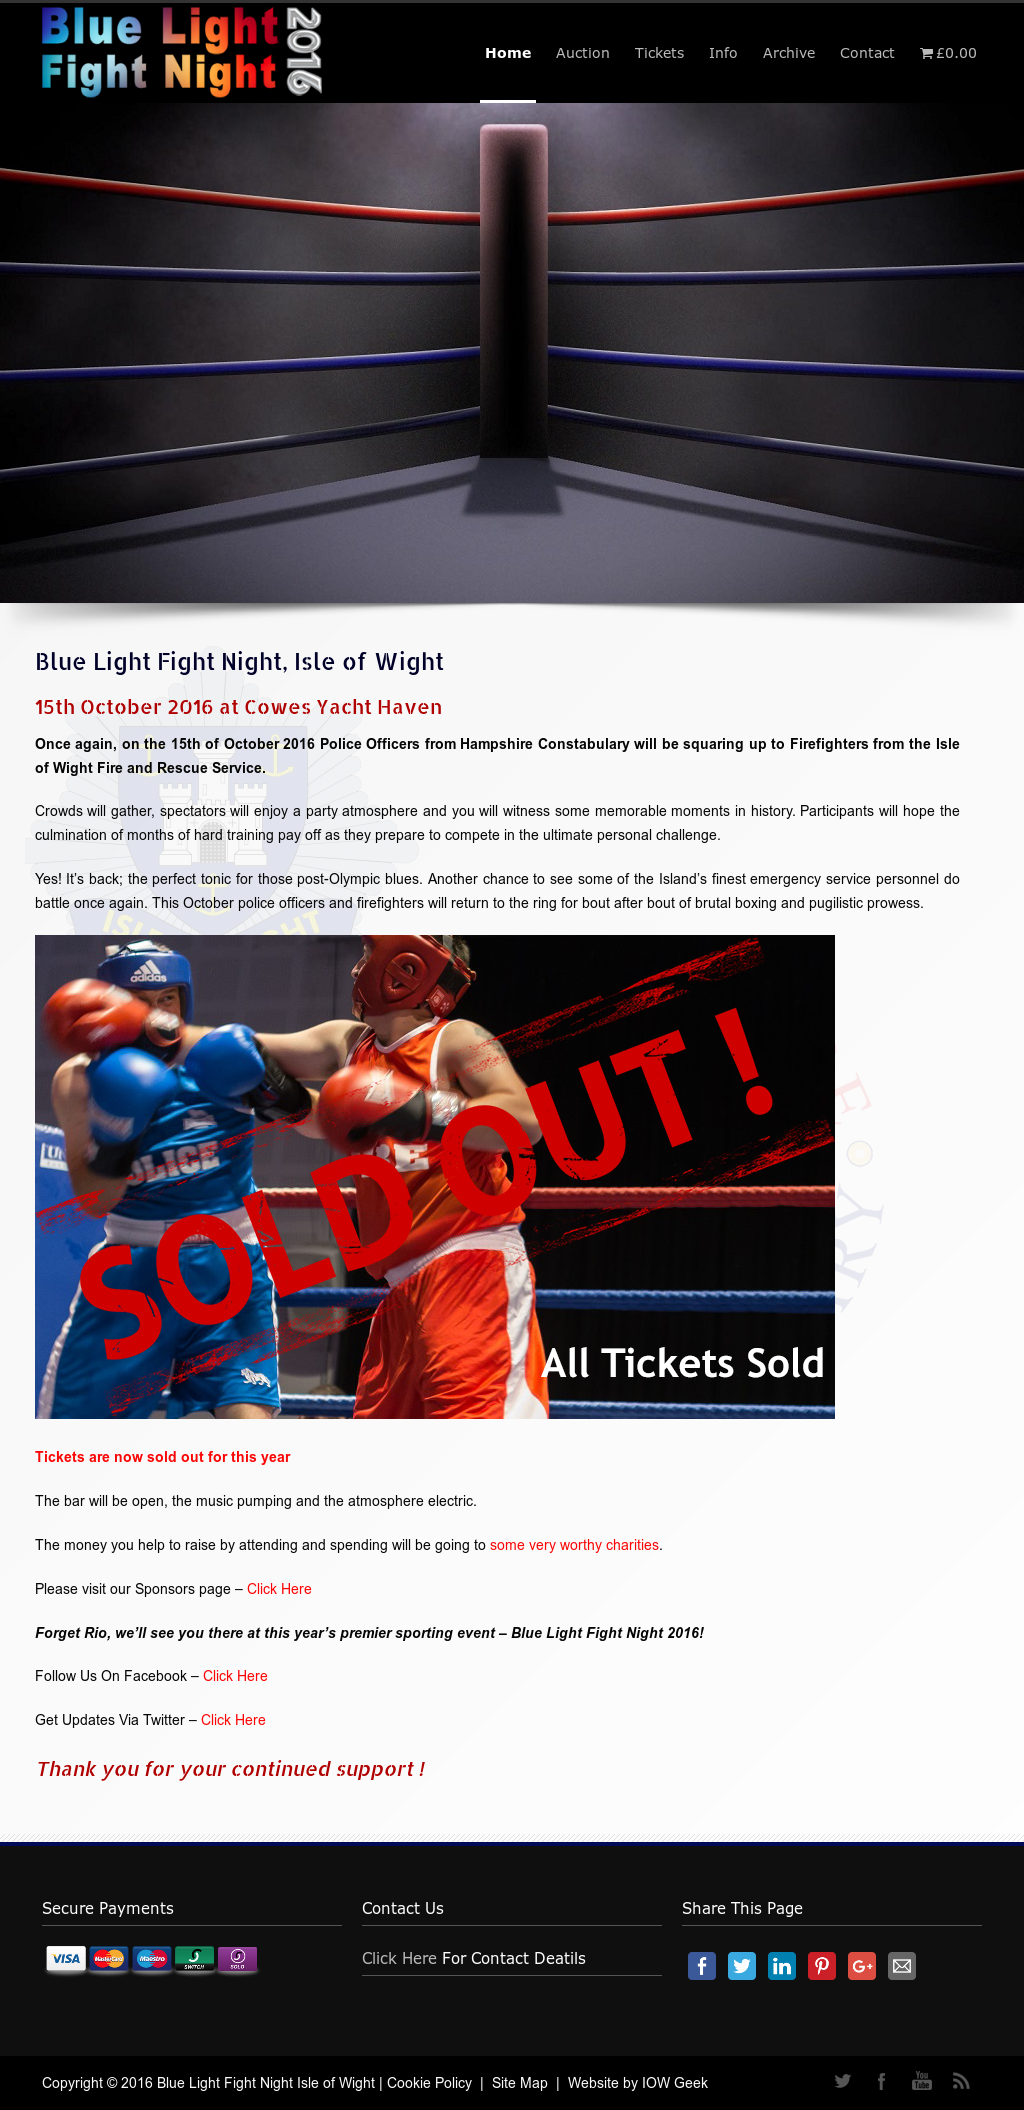 Blue Light Fight Night Isle Of Wight Competitors, Revenue